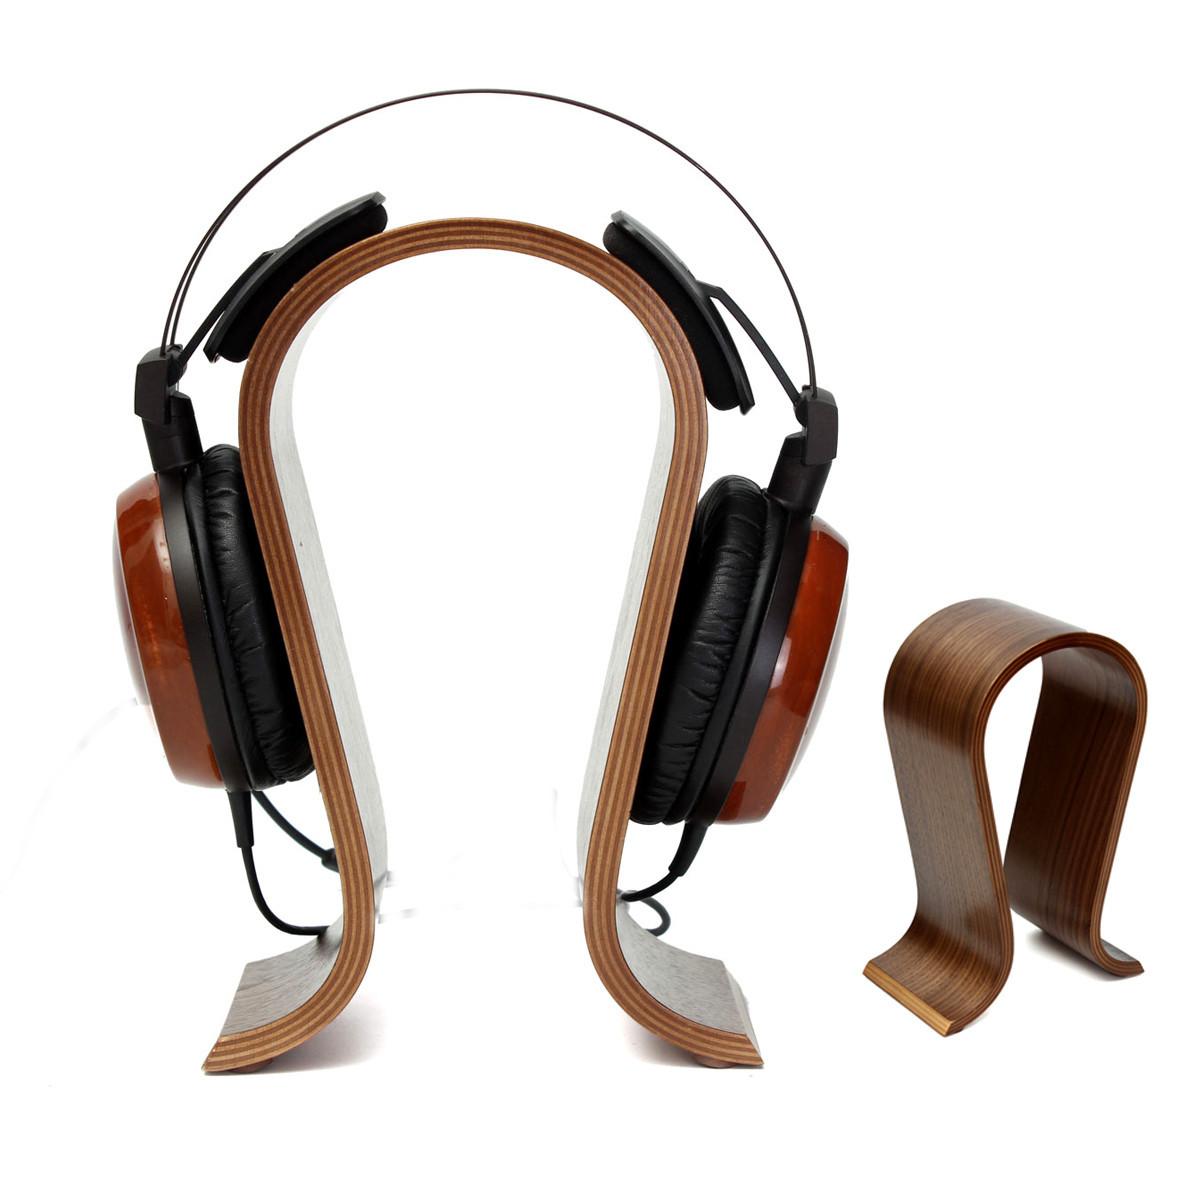 ELE Solid Wooden Gaming Headset Earphone Headphone Stand Hanger Holder Display Rack